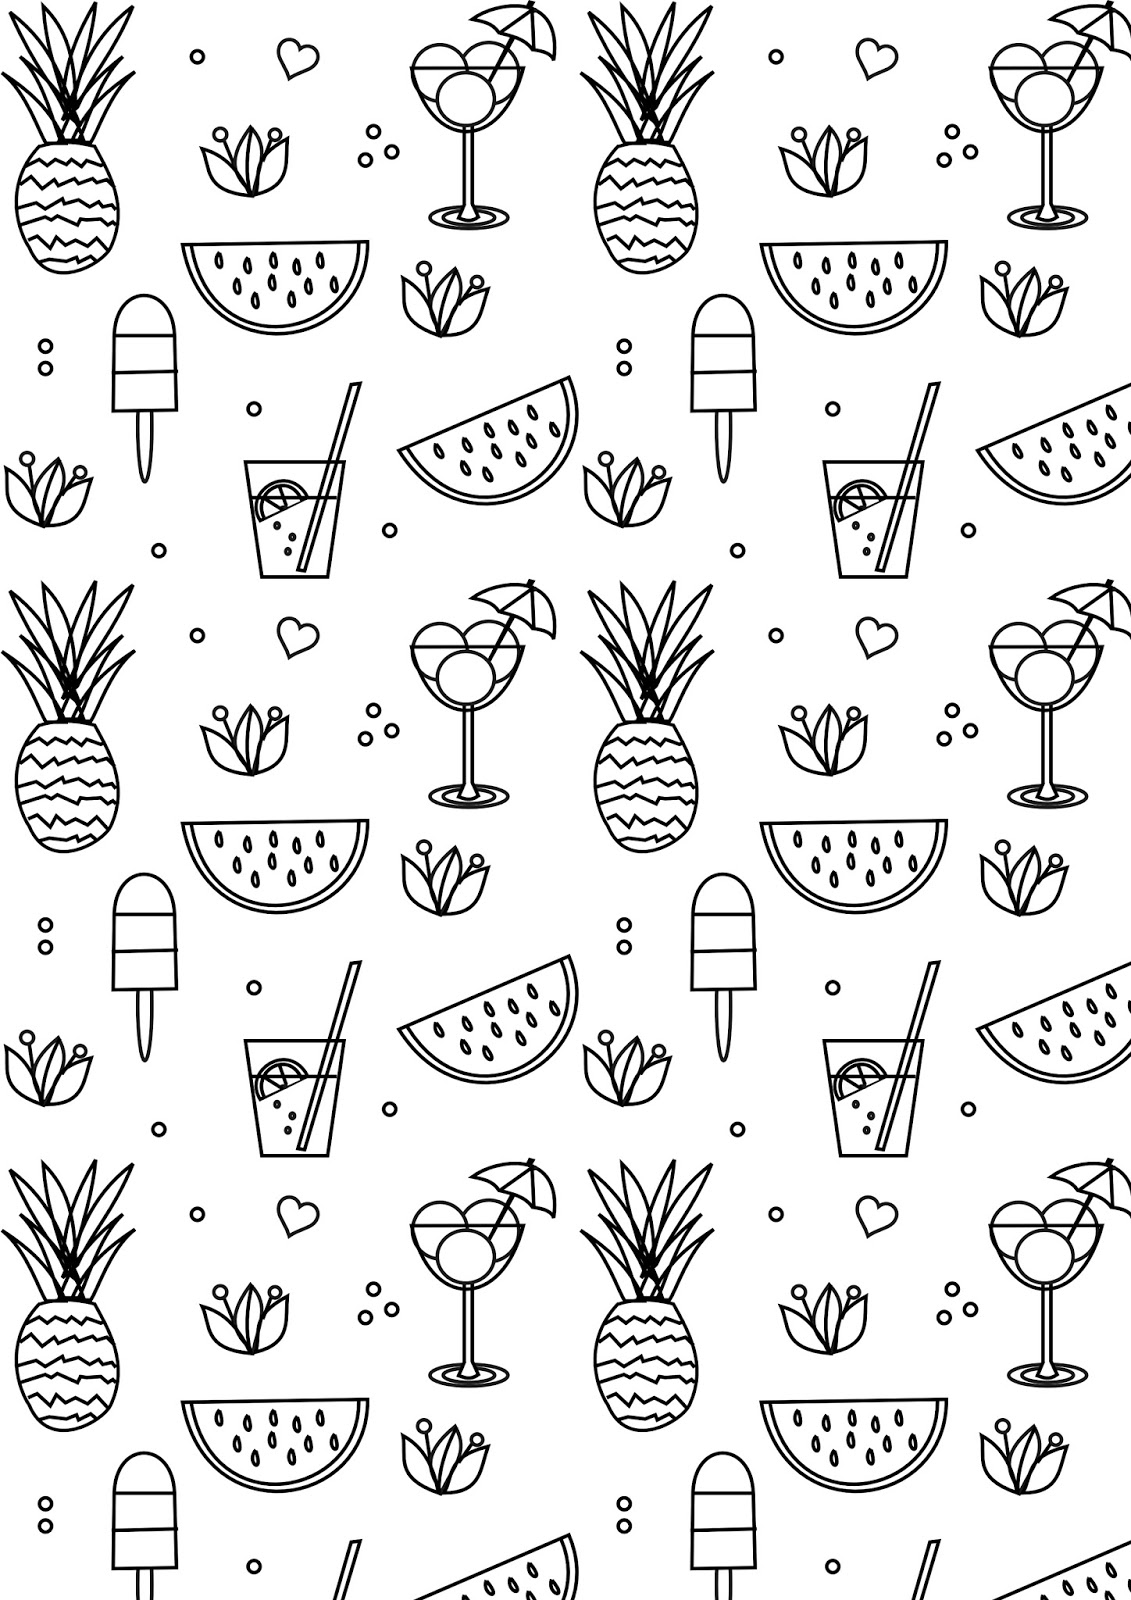 Free printable summer coloring page - ausdruckbare ...